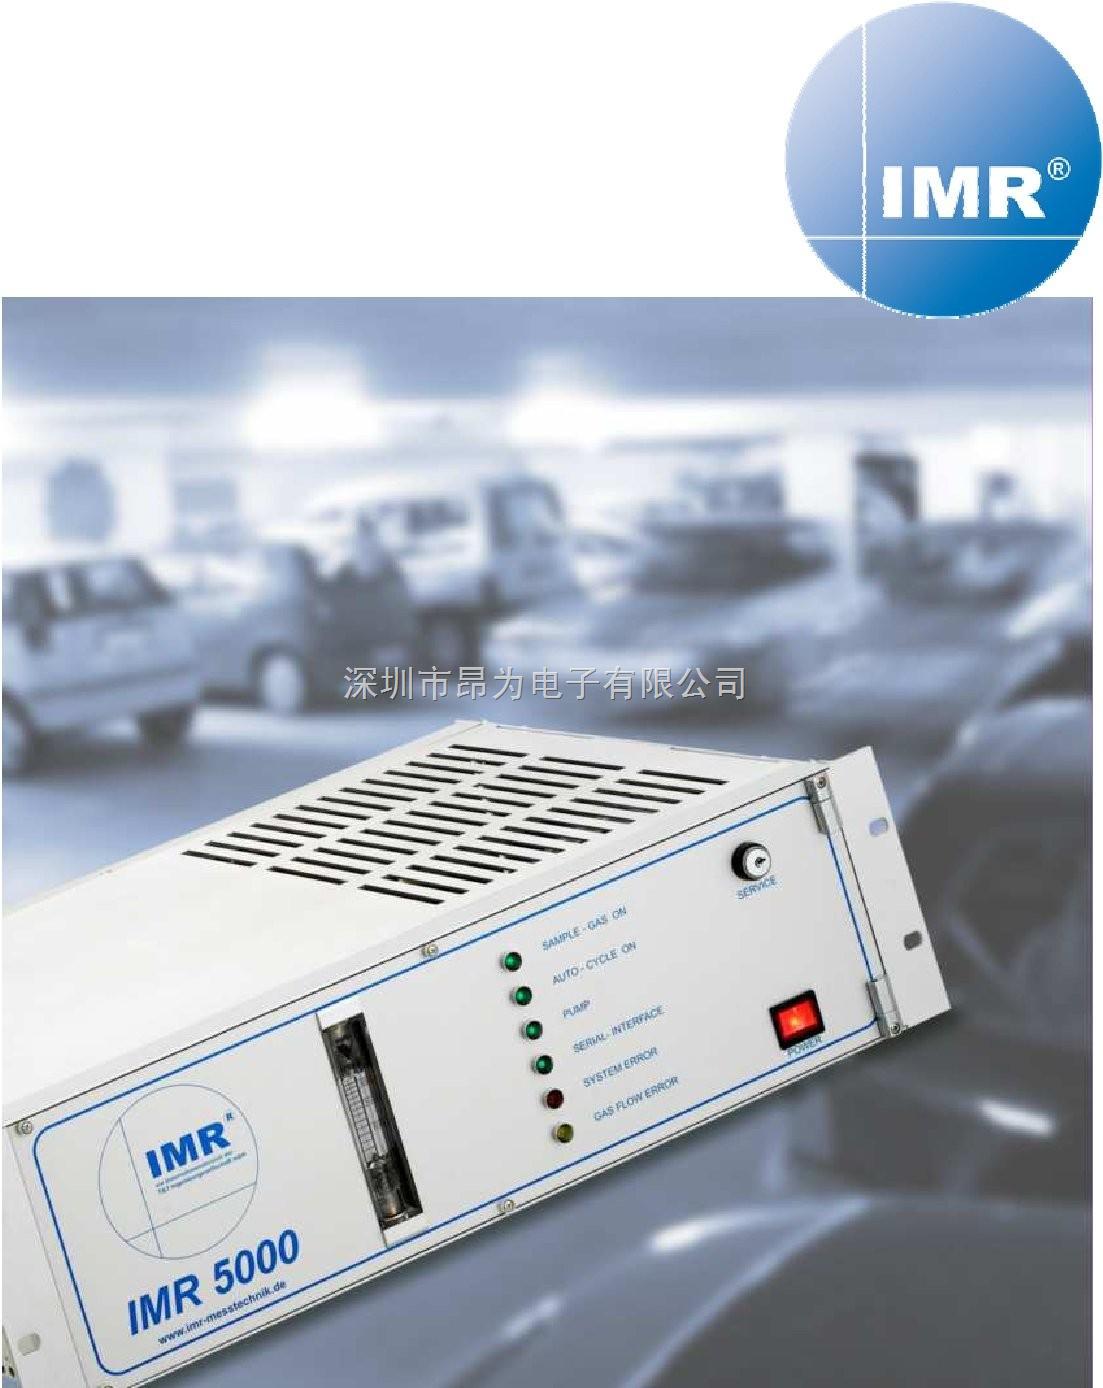 IMR 5000-连续排放监测系统(CEM) IMR 5000